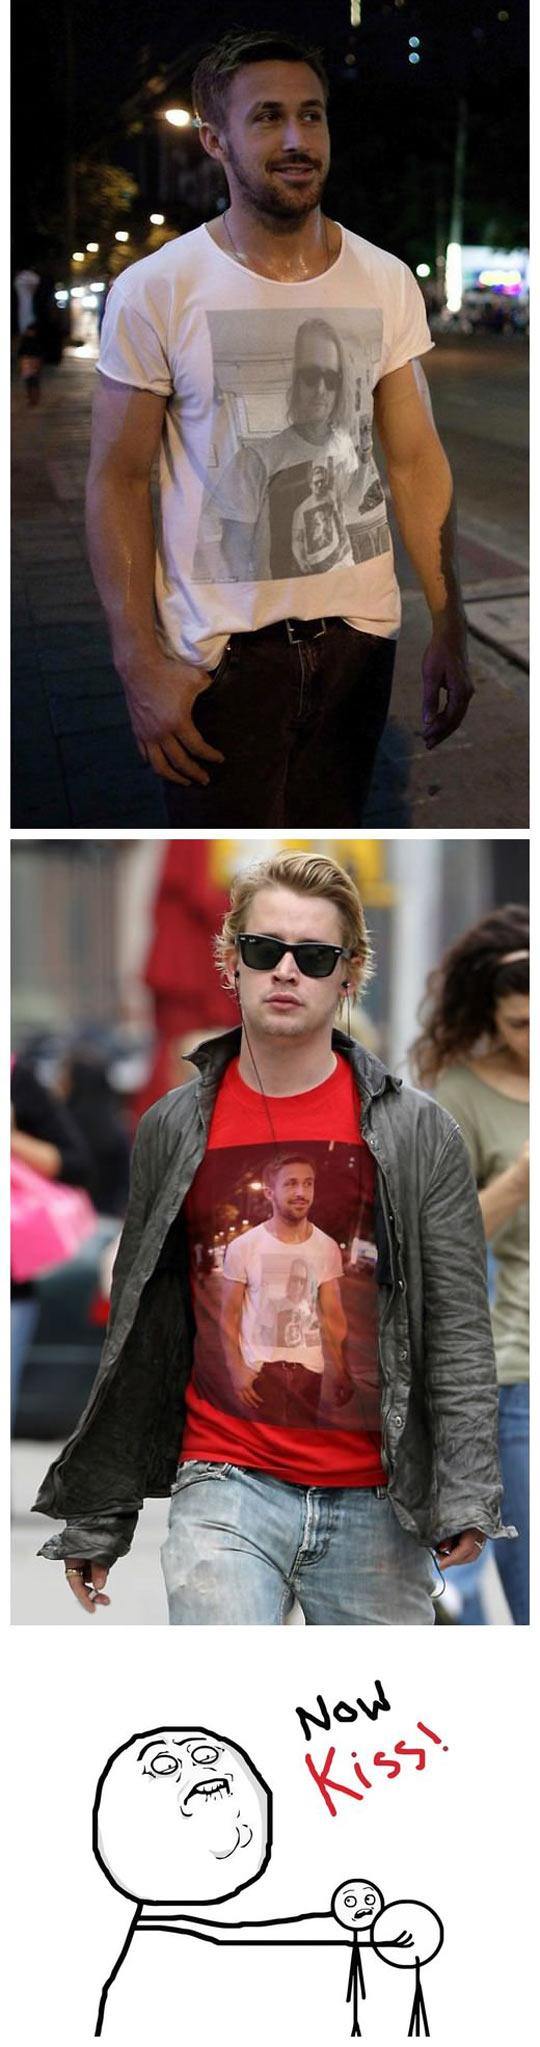 funny-Macaulay-Culkin-Ryan-Gosling-shirt-response